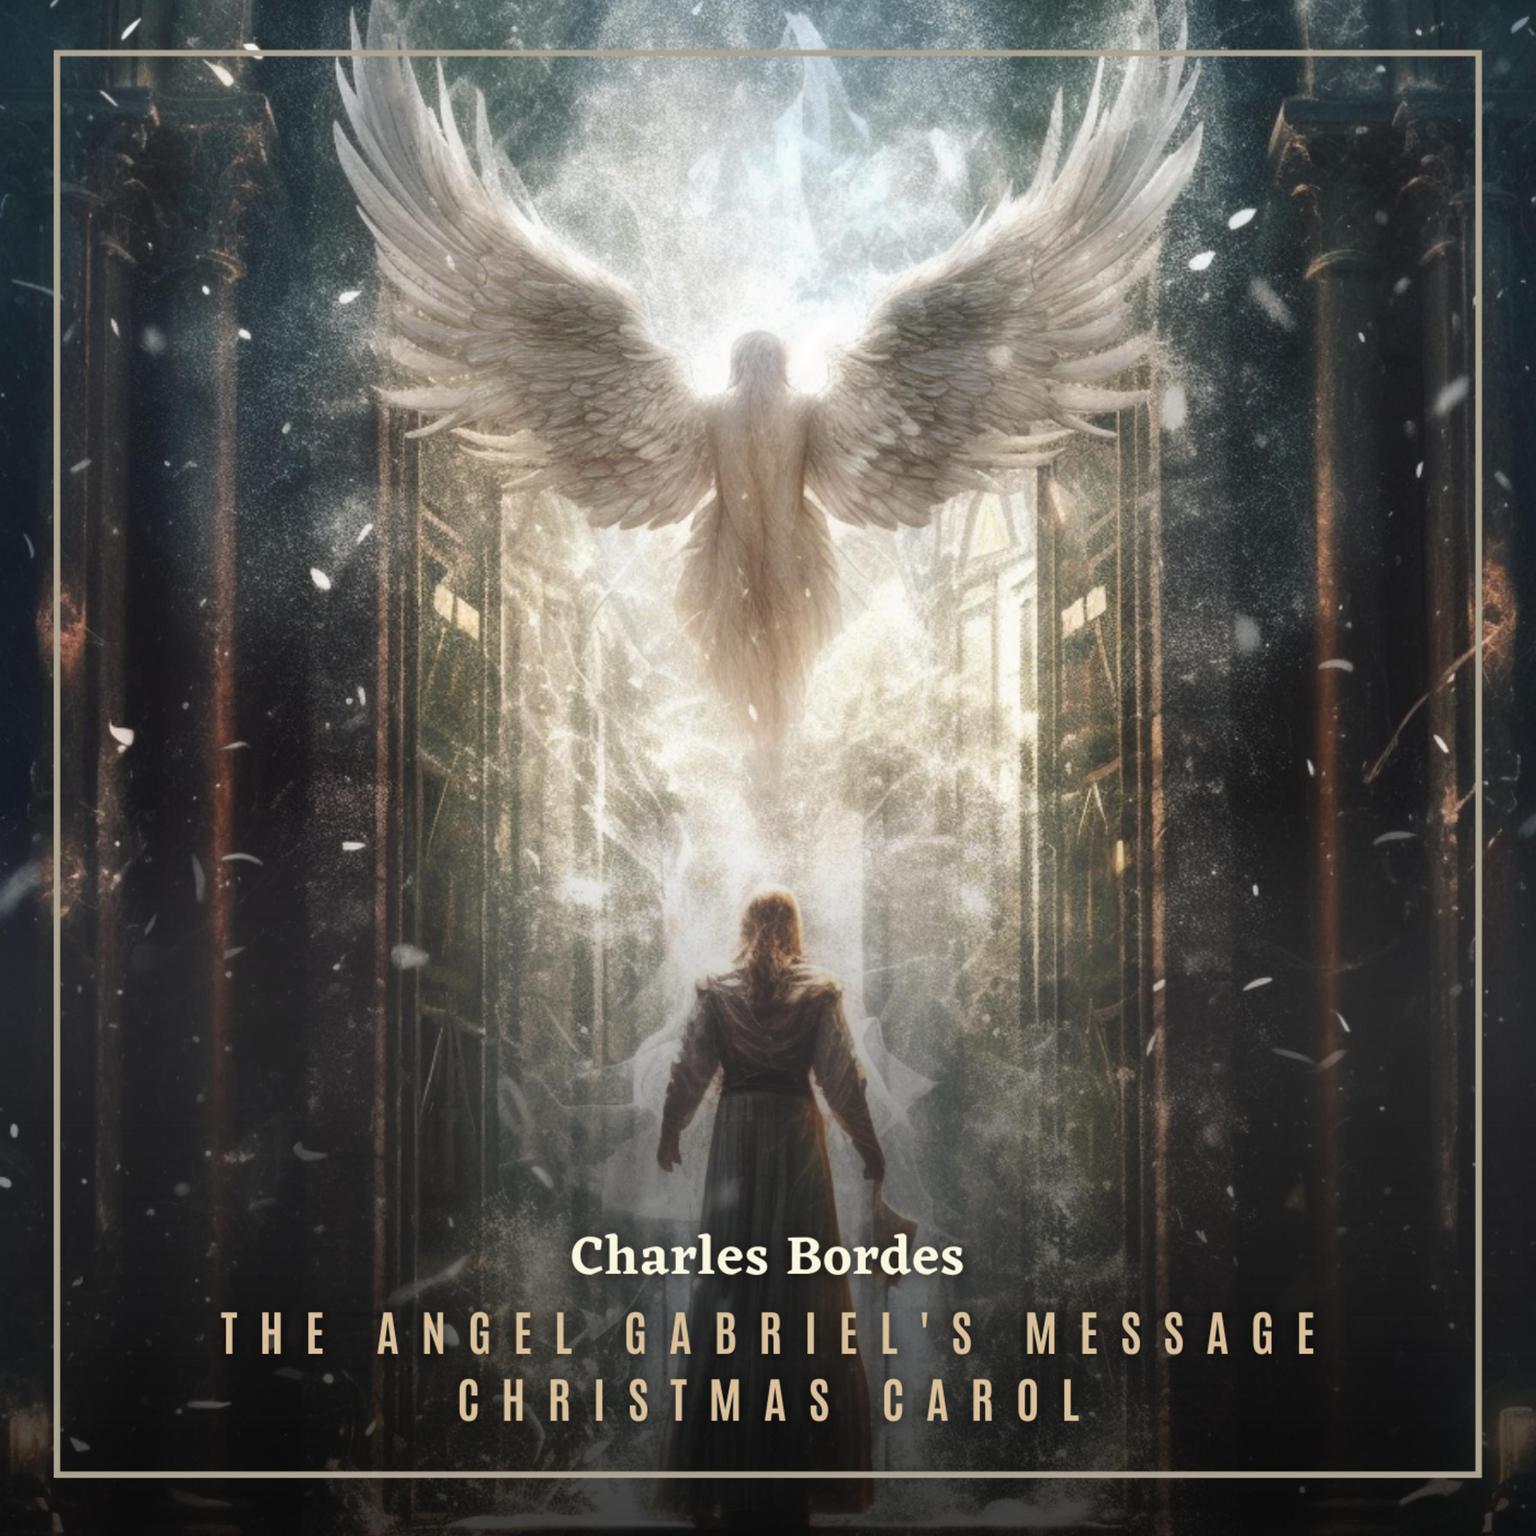 The Angel Gabriels Message Christmas Carol Audiobook, by Greg Cetus